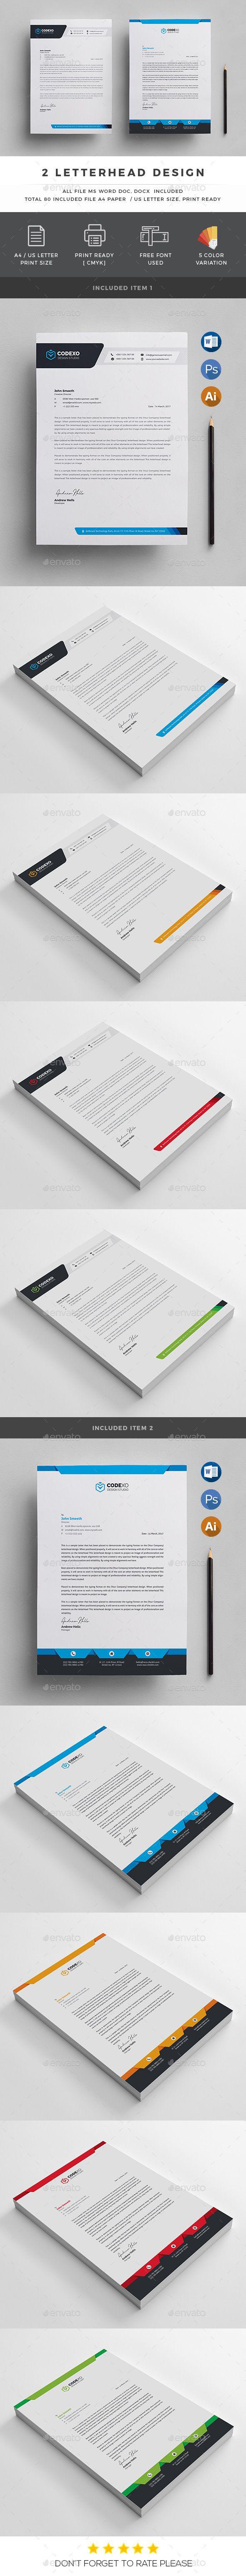 Letterhead Template PSD, Vector EPS, AI Illustrator, MS Word